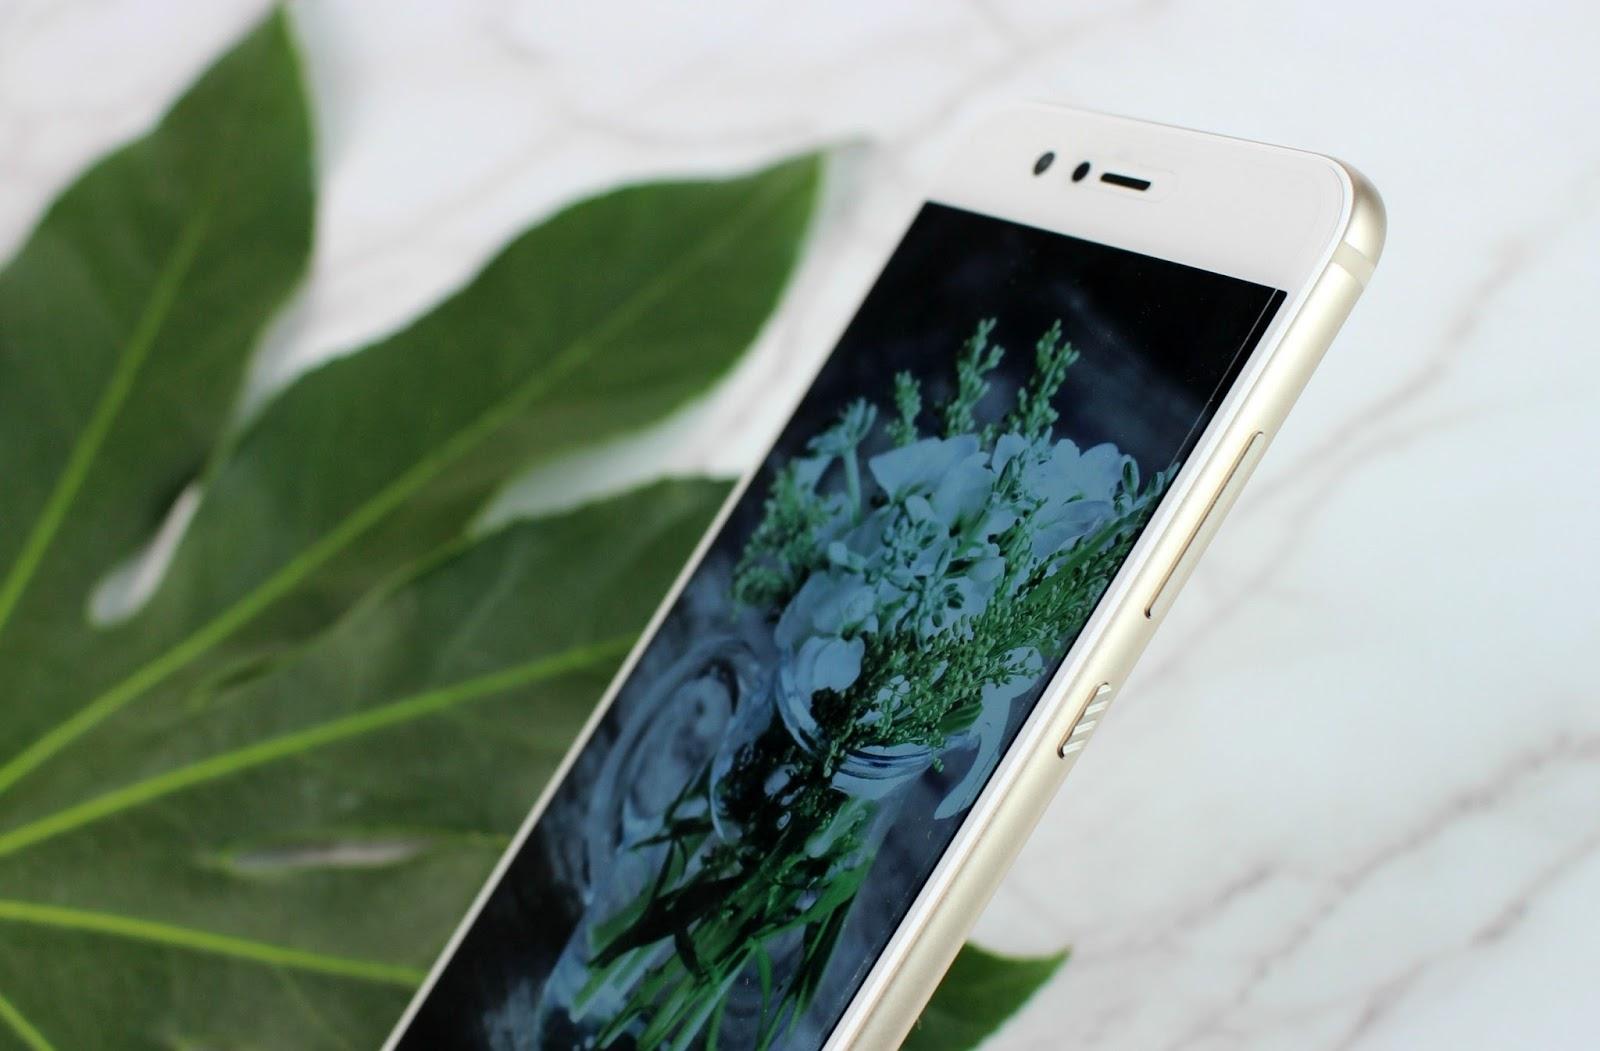 20 megapixel frontkamera, aluminiumgehäuse, android, bokeh, dual hauptkamera, dual sim, erfahrung, huawei, nova 2, prestige gold, review, selfie superstar, smartphone der gehobenen mittelklasse, test, testbericht,